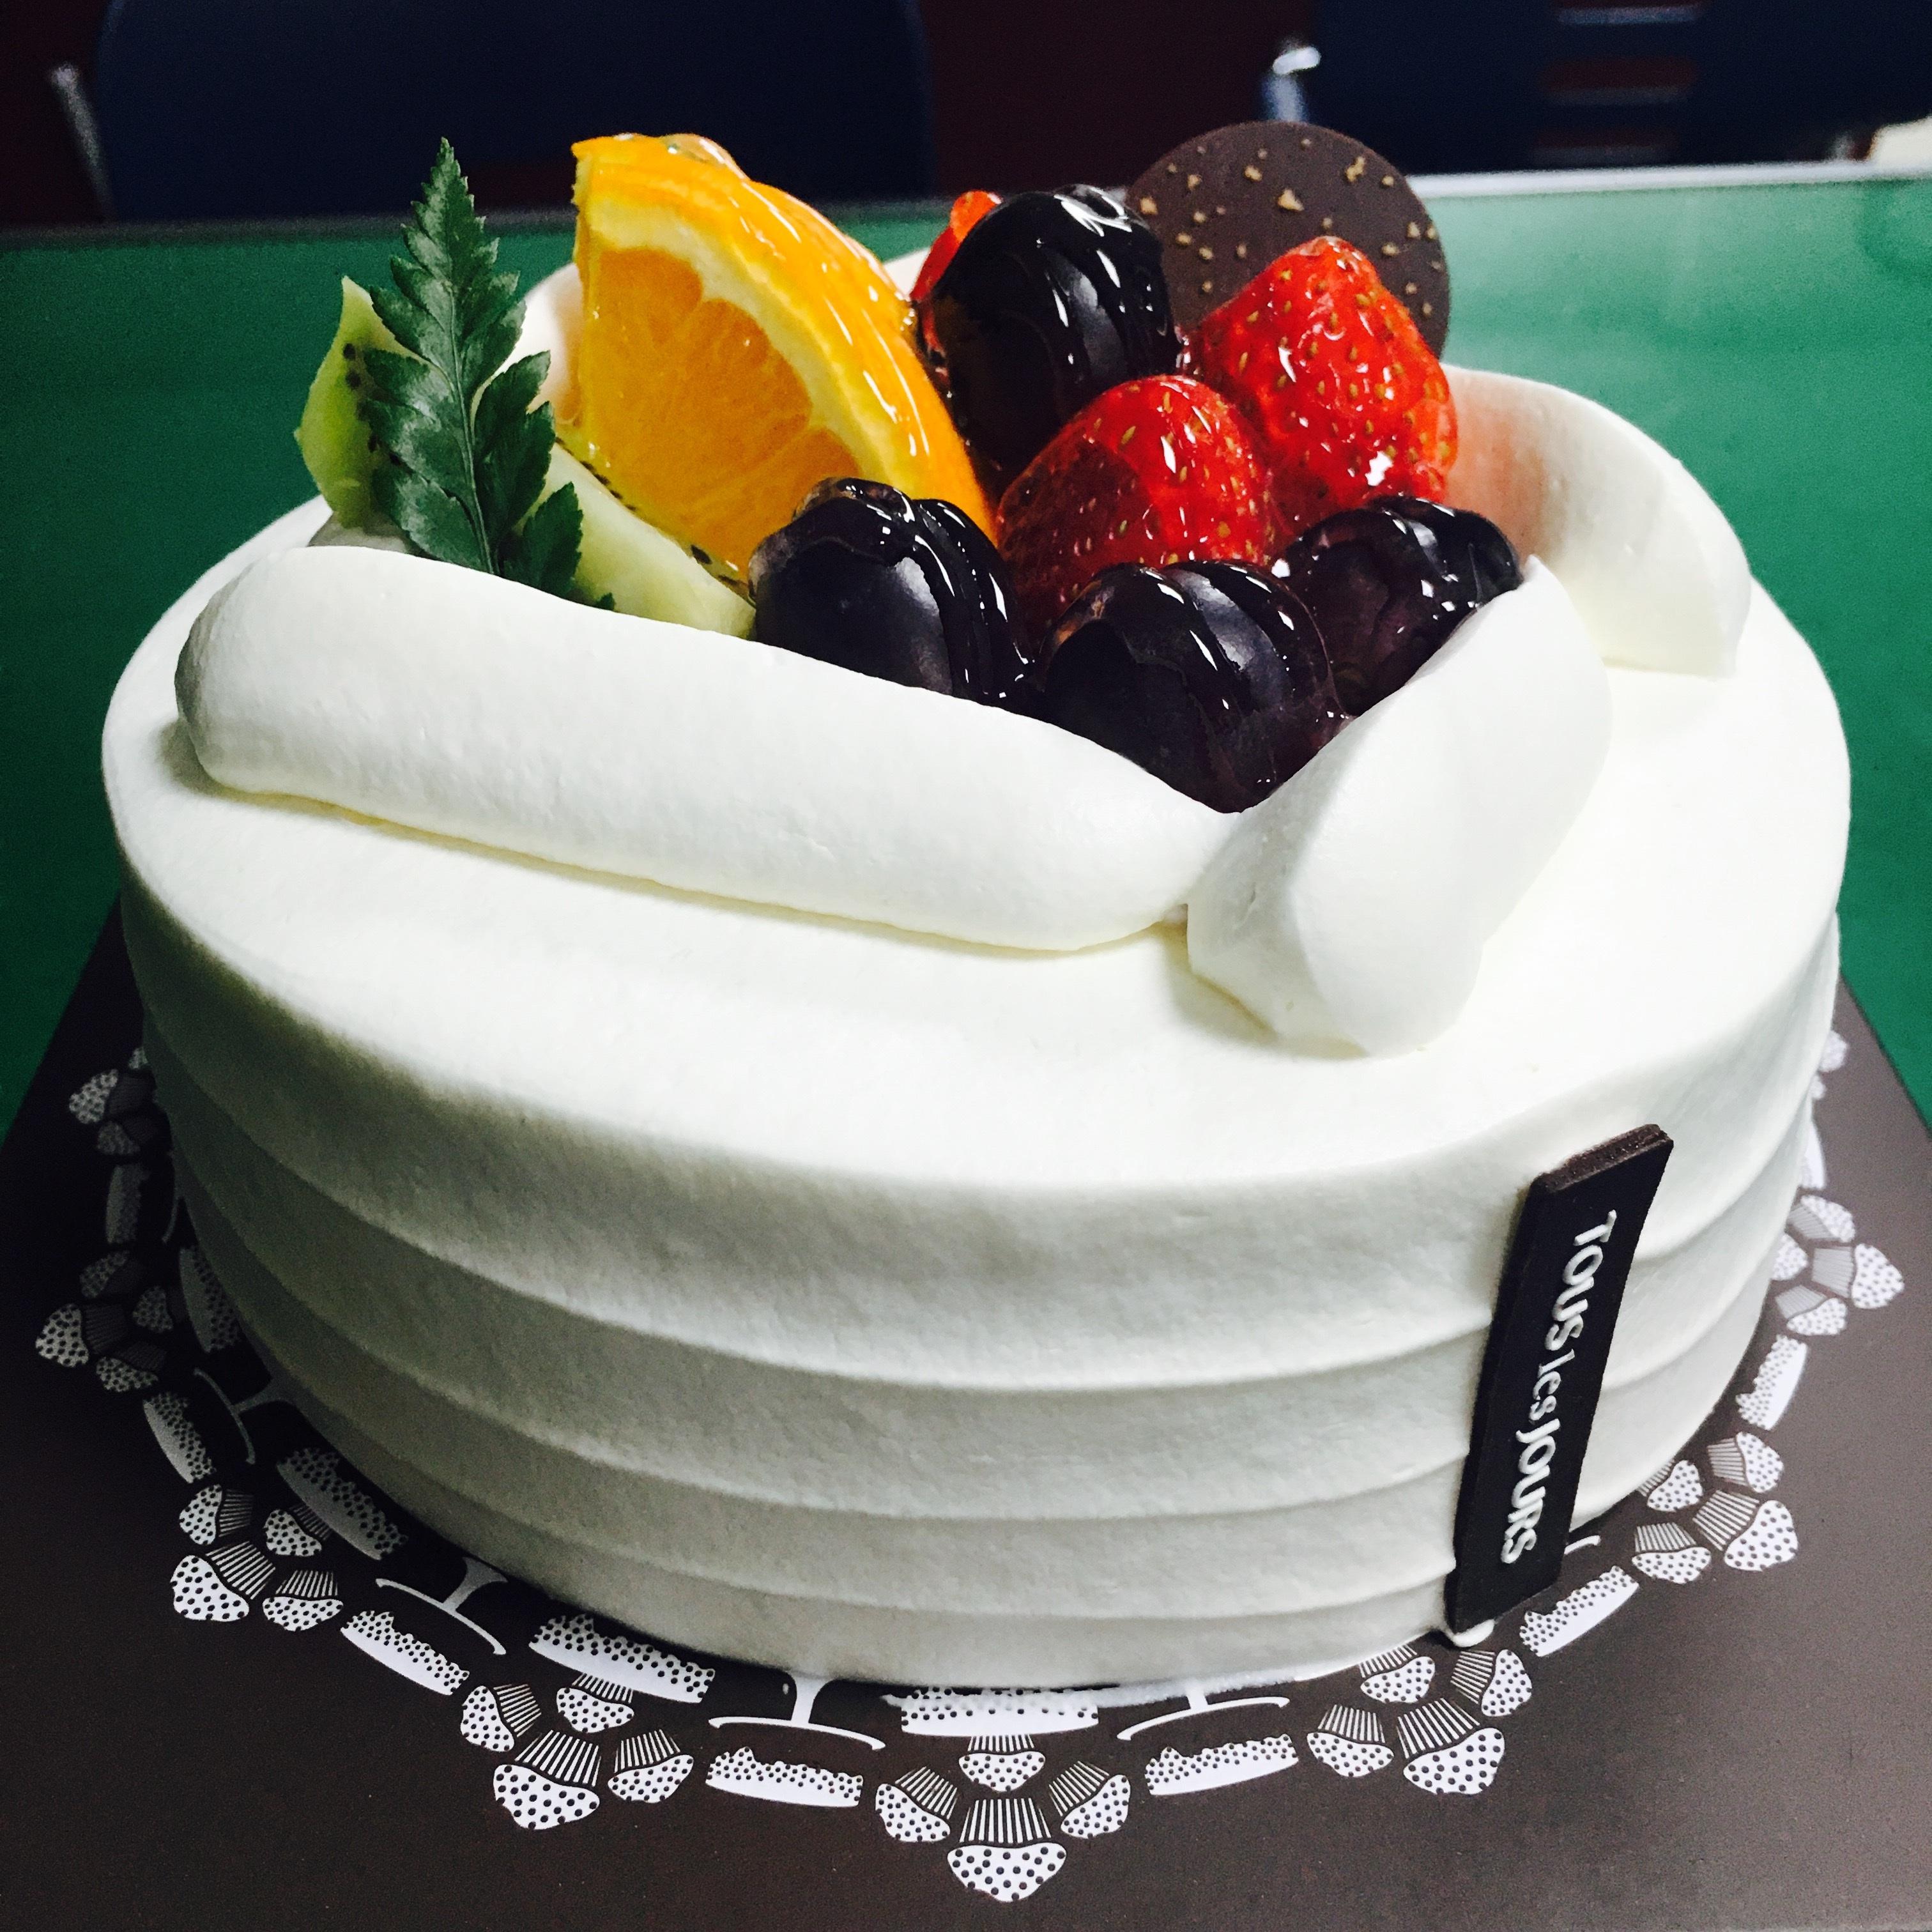 Fotos gratis : Fruta, dulce, comida, Produce, bocadillo, postre ...